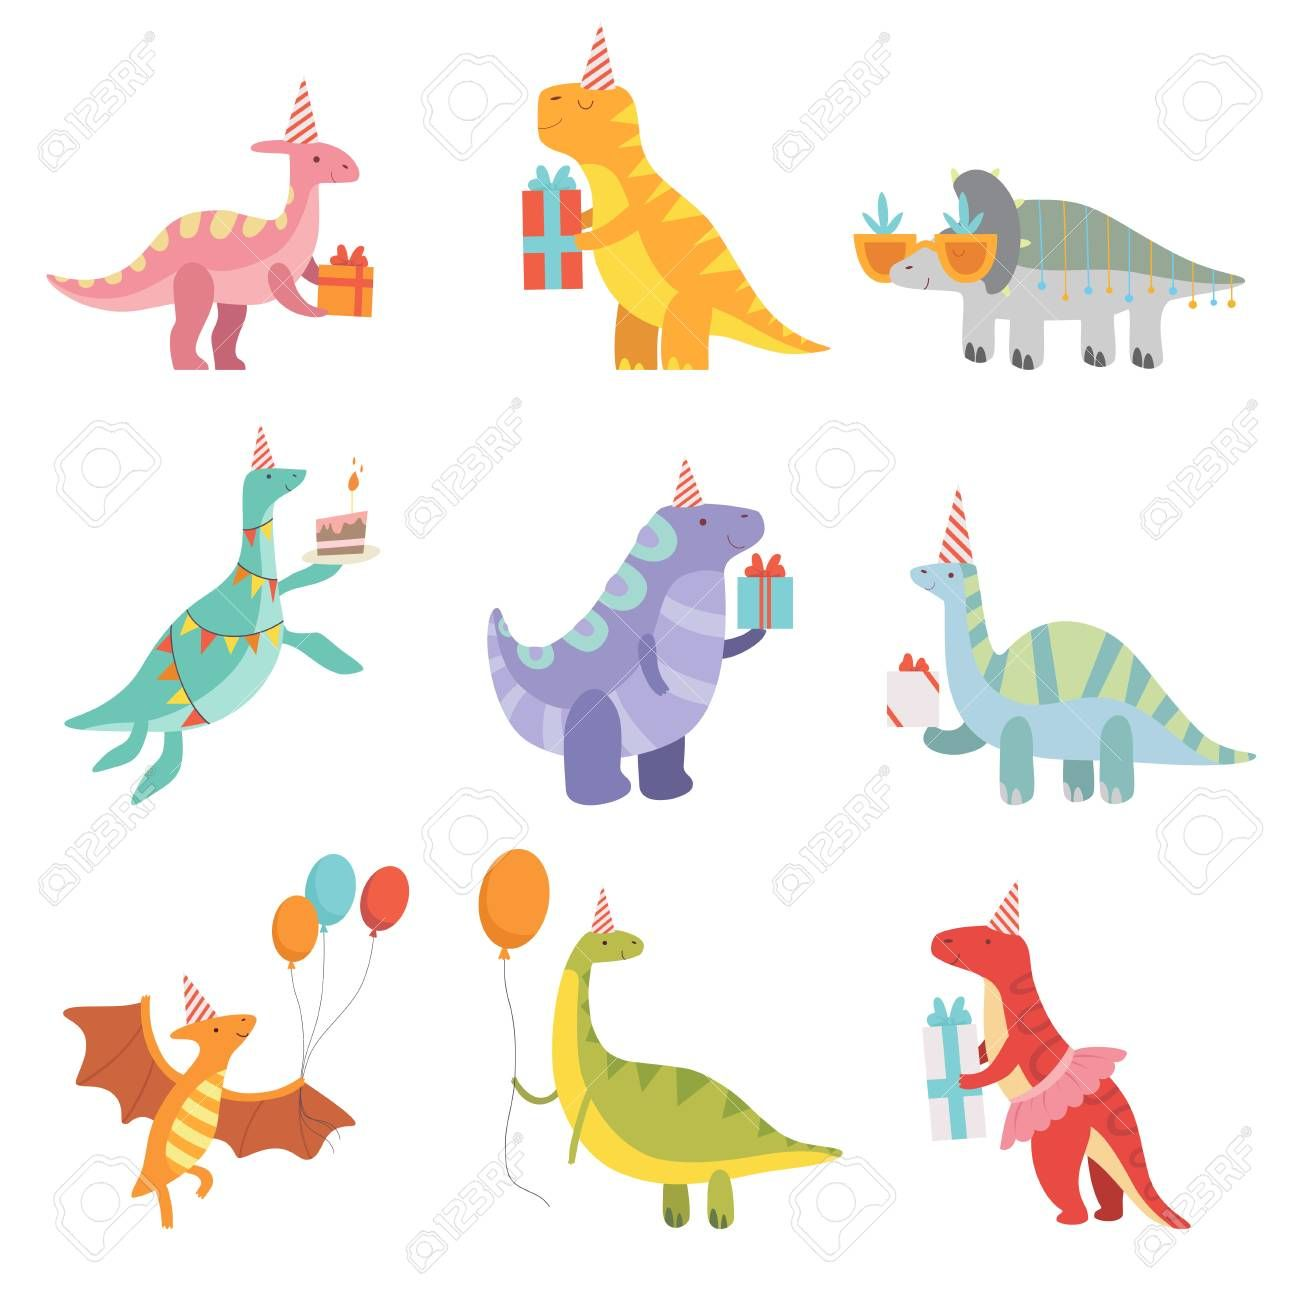 27+ Dinosaur with birthday hat clipart ideas in 2021